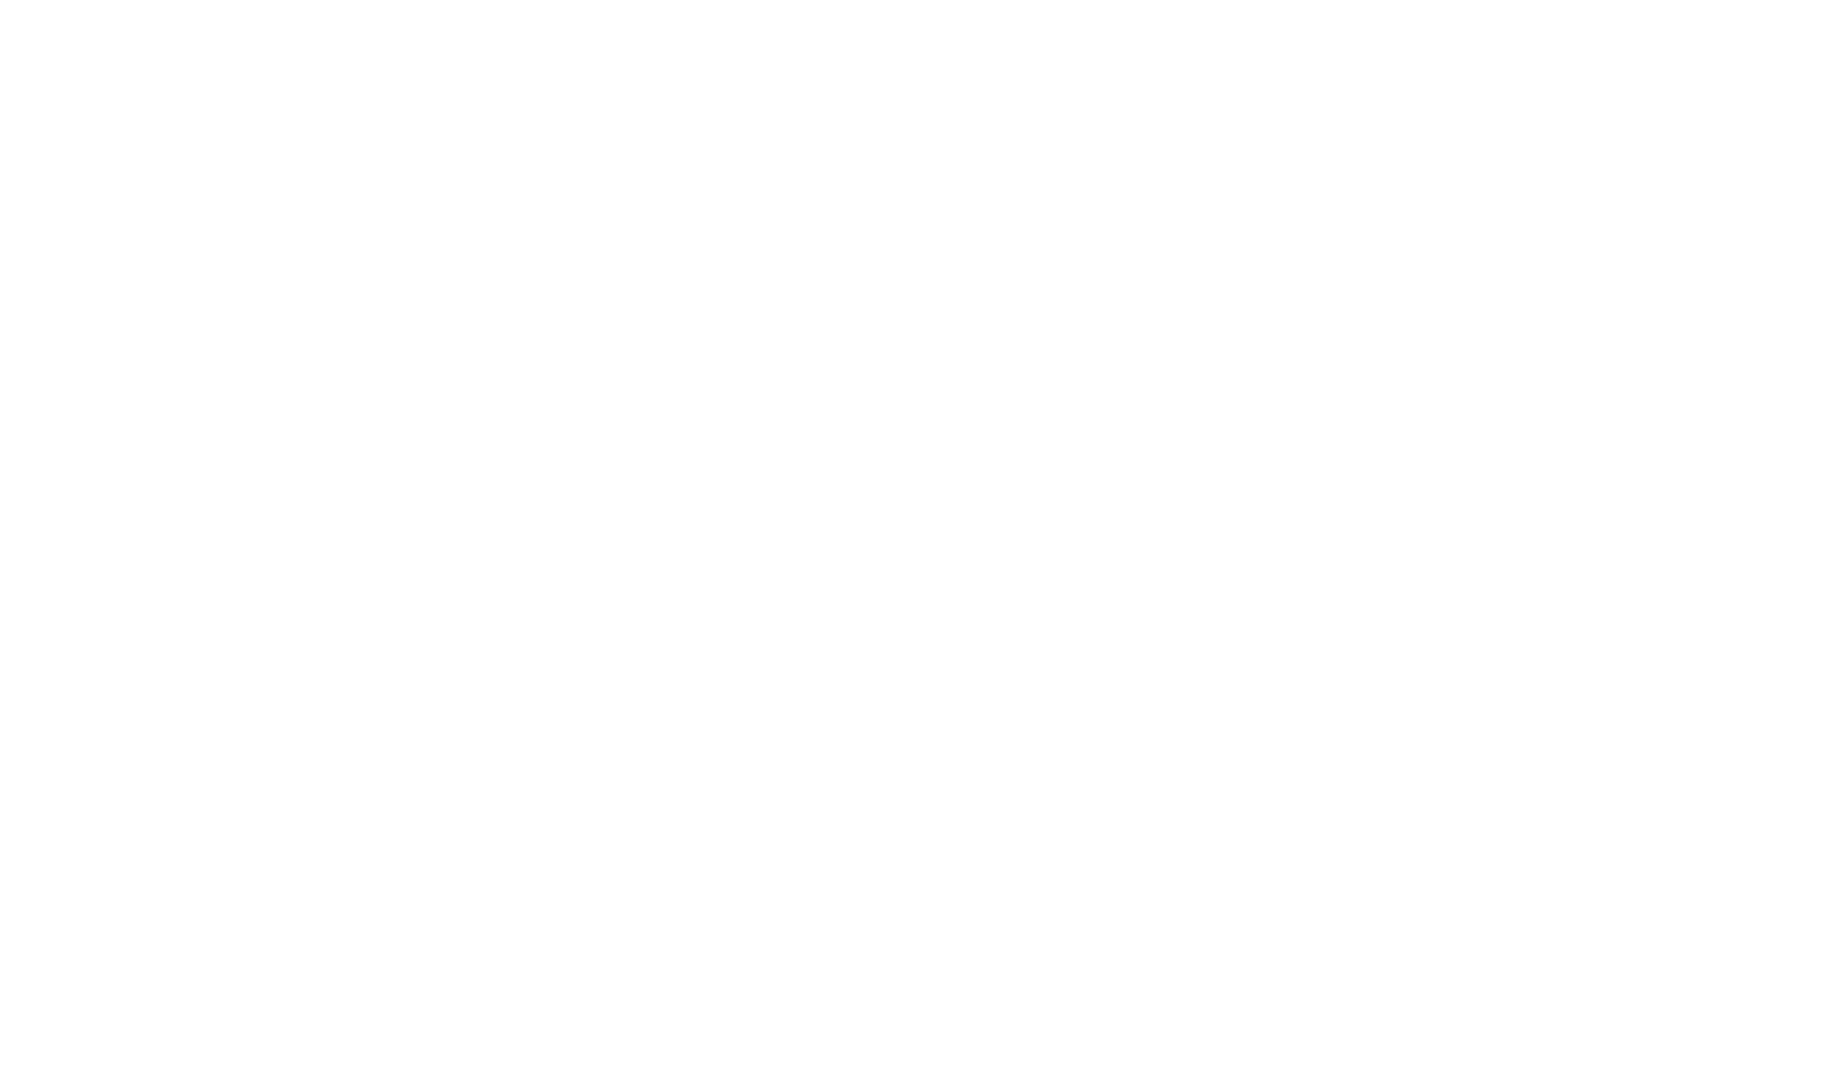 PHPWhite